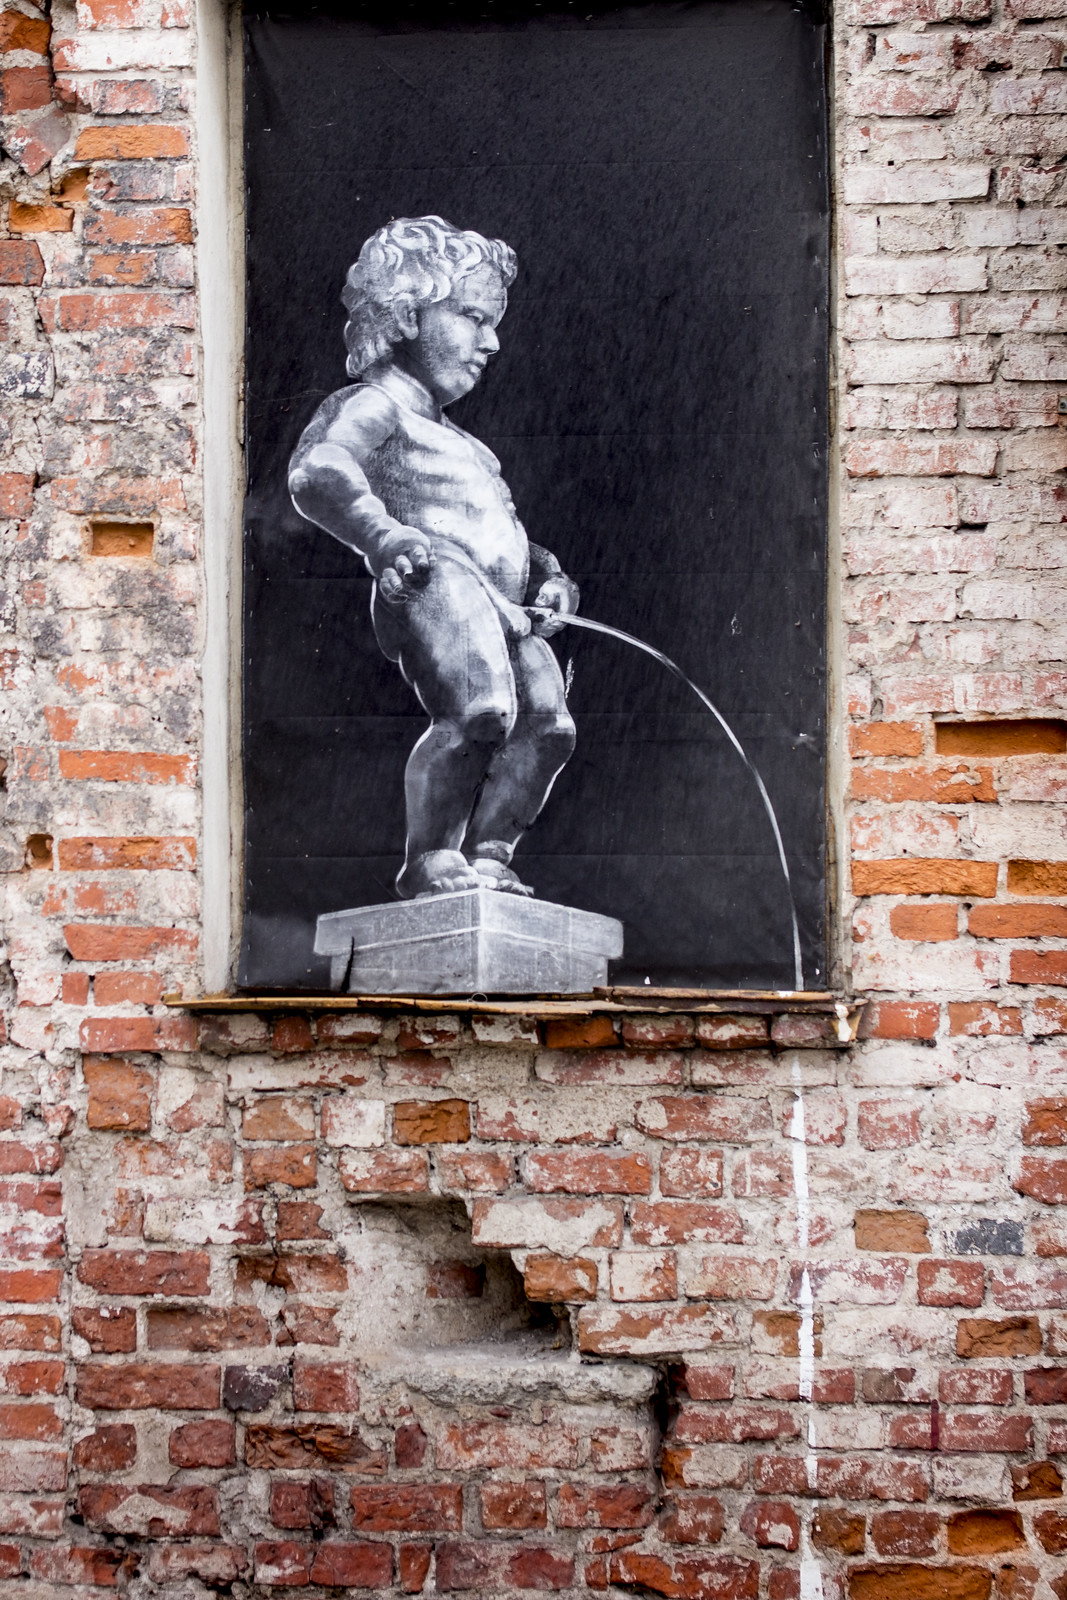 Manneken pis - Banksy in Kaunas, Kowno, Lithuania